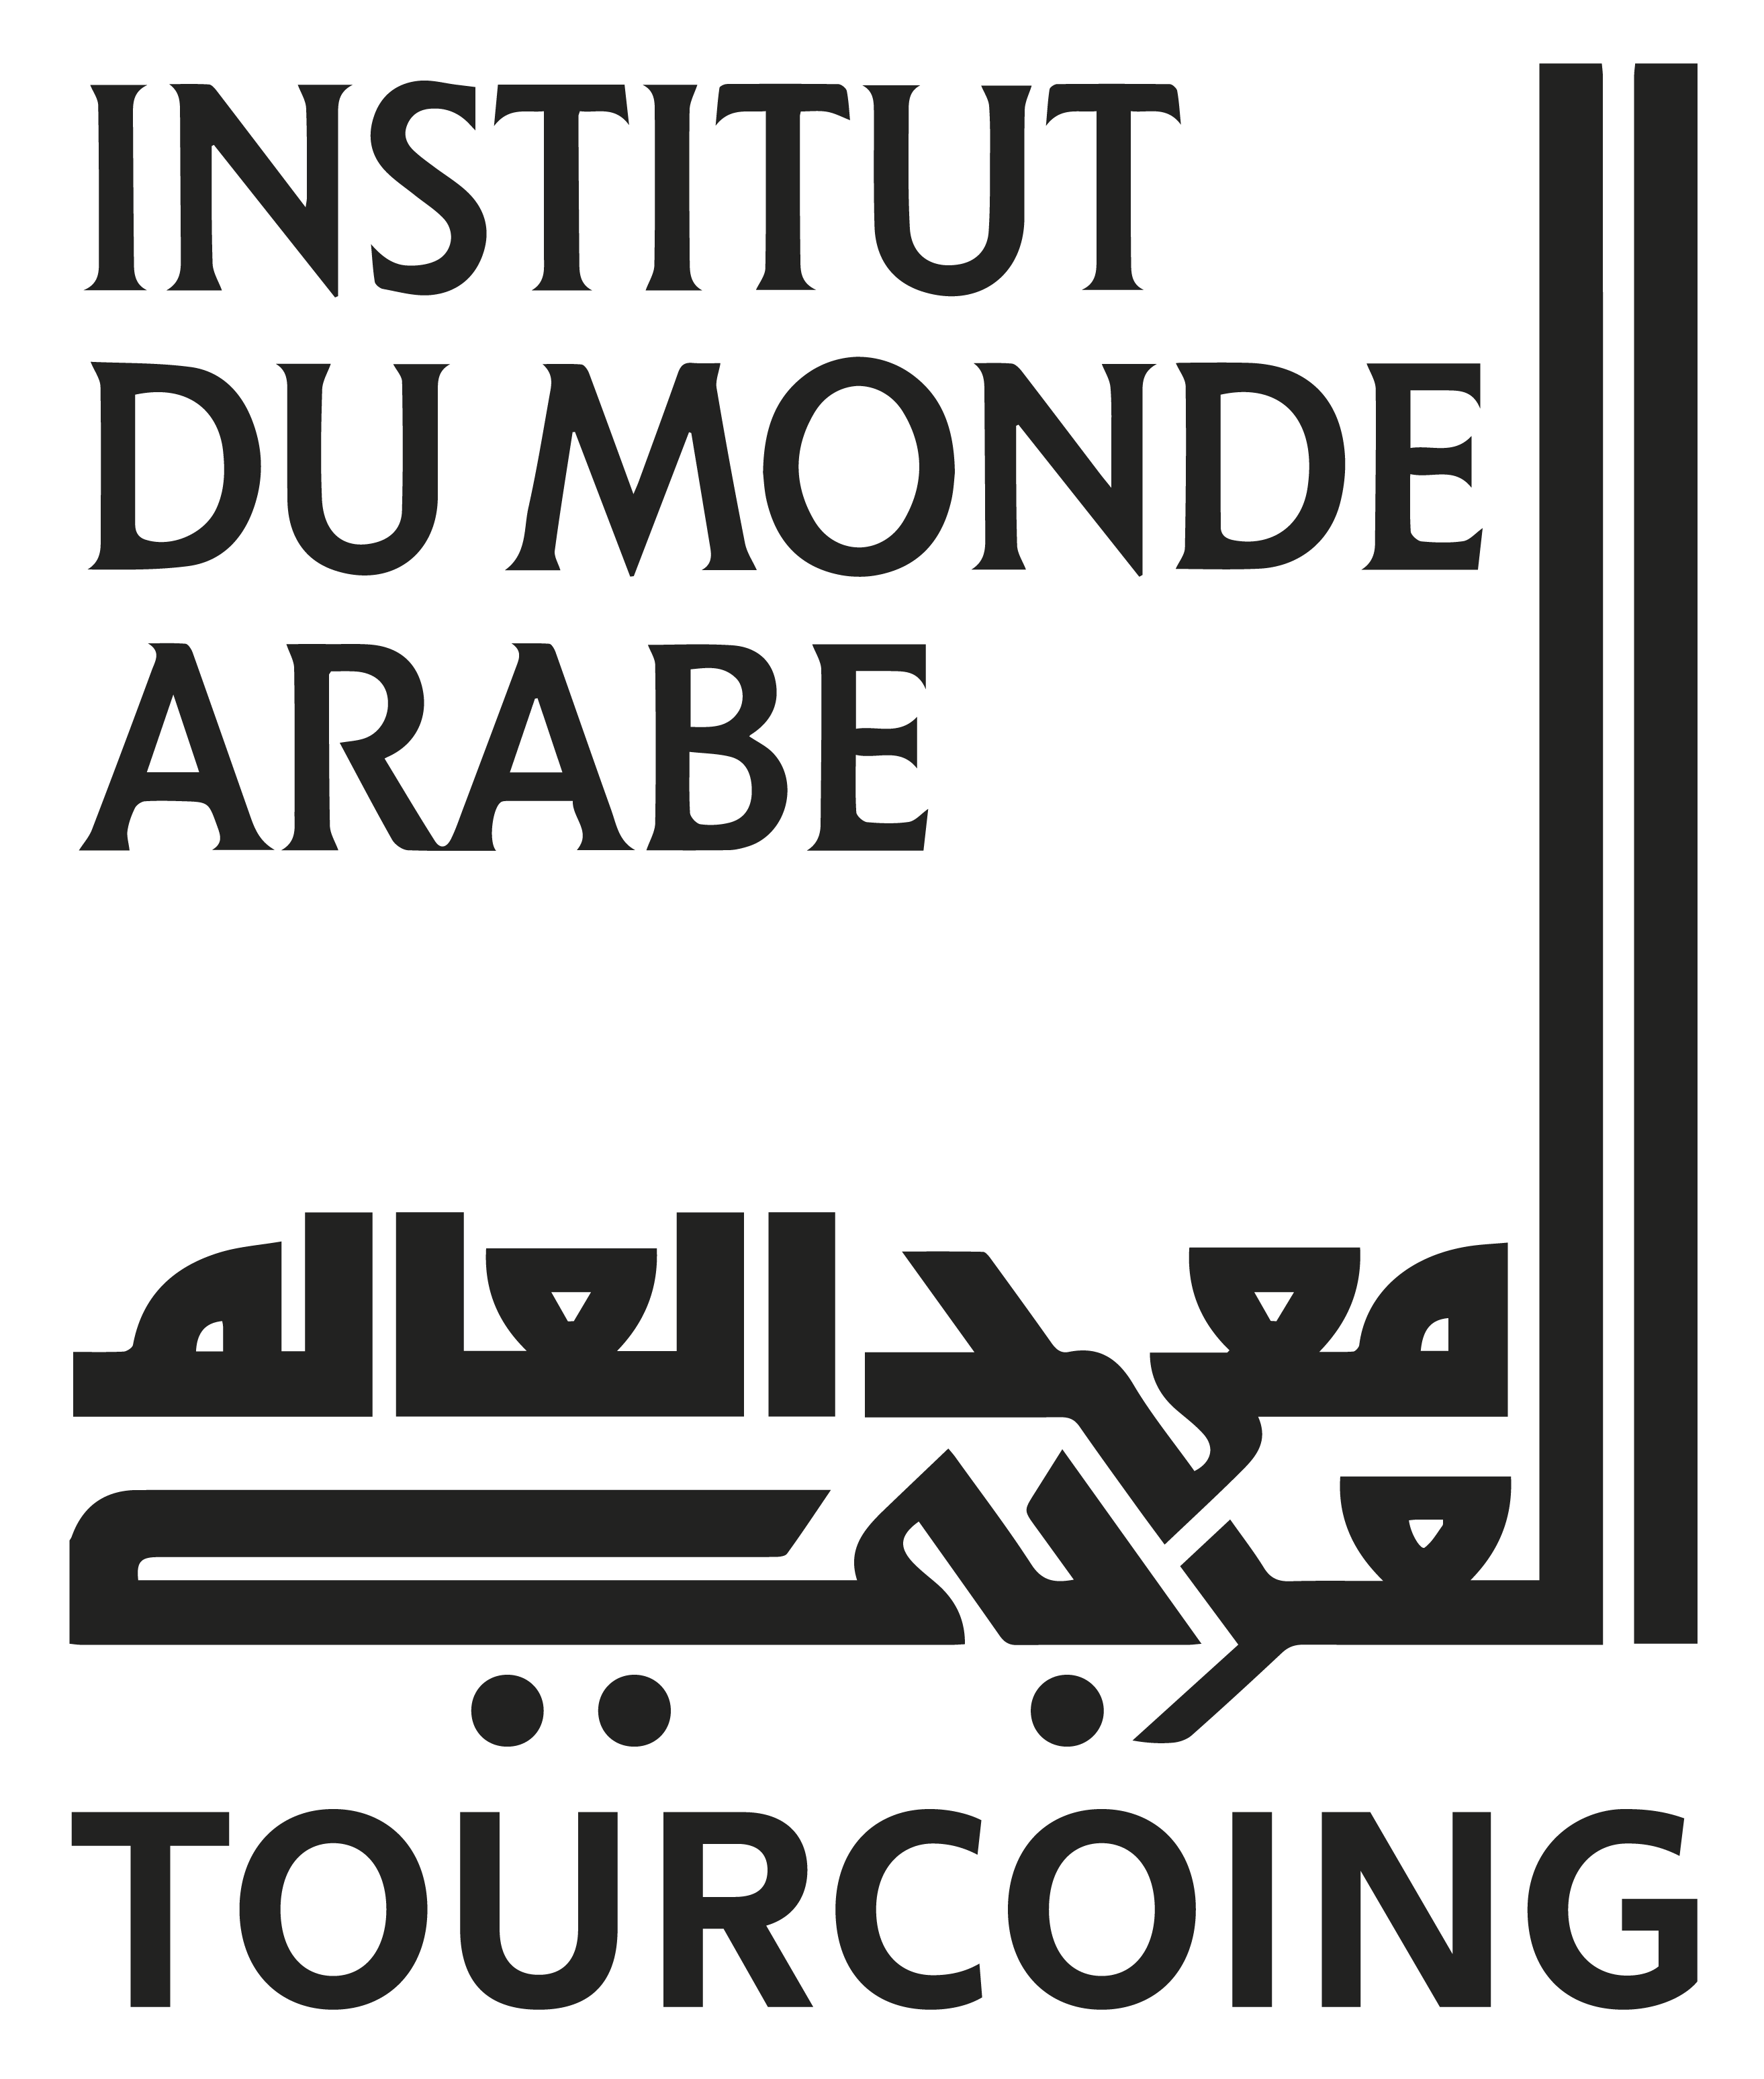 Institut du monde arabe - Tourcoing